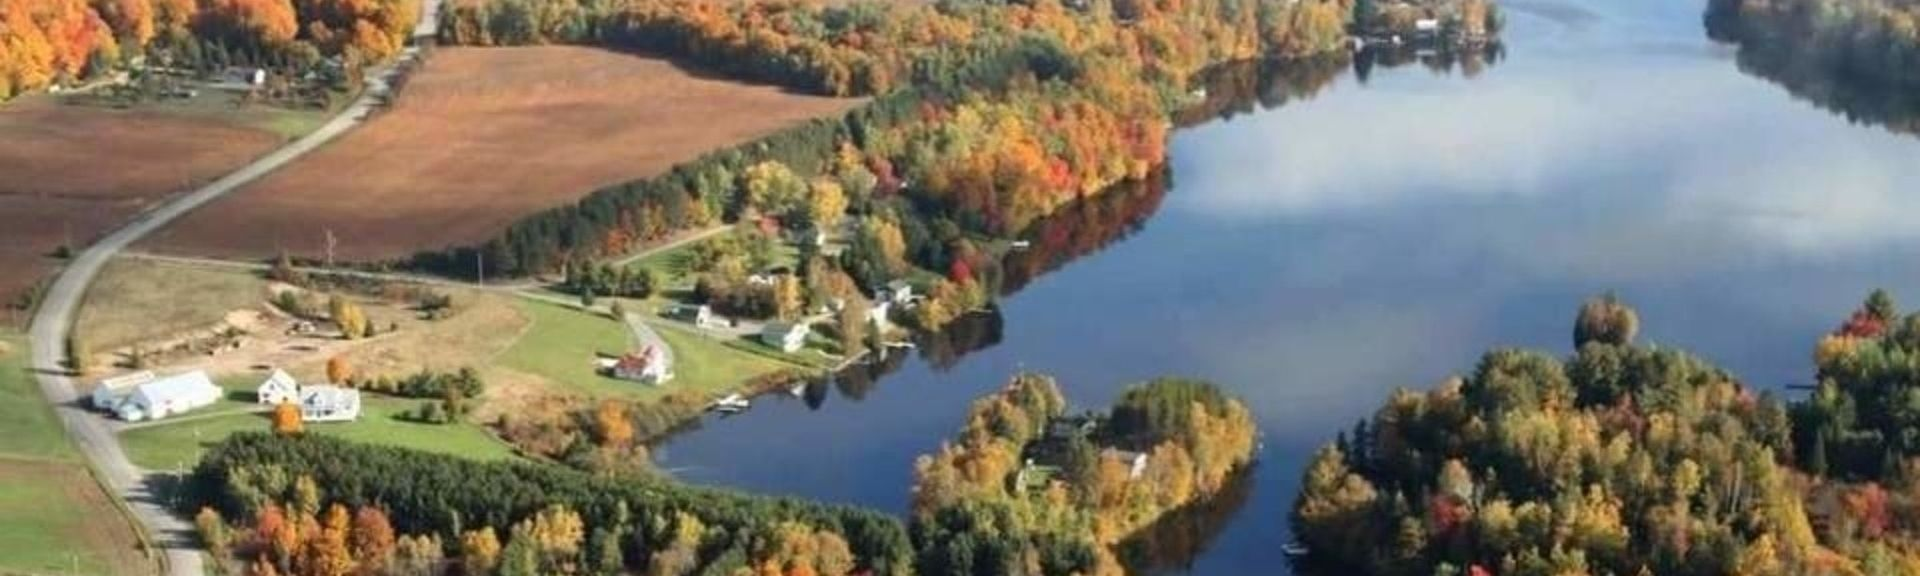 Portneuf Regional County Municipality, Quebec, Canada